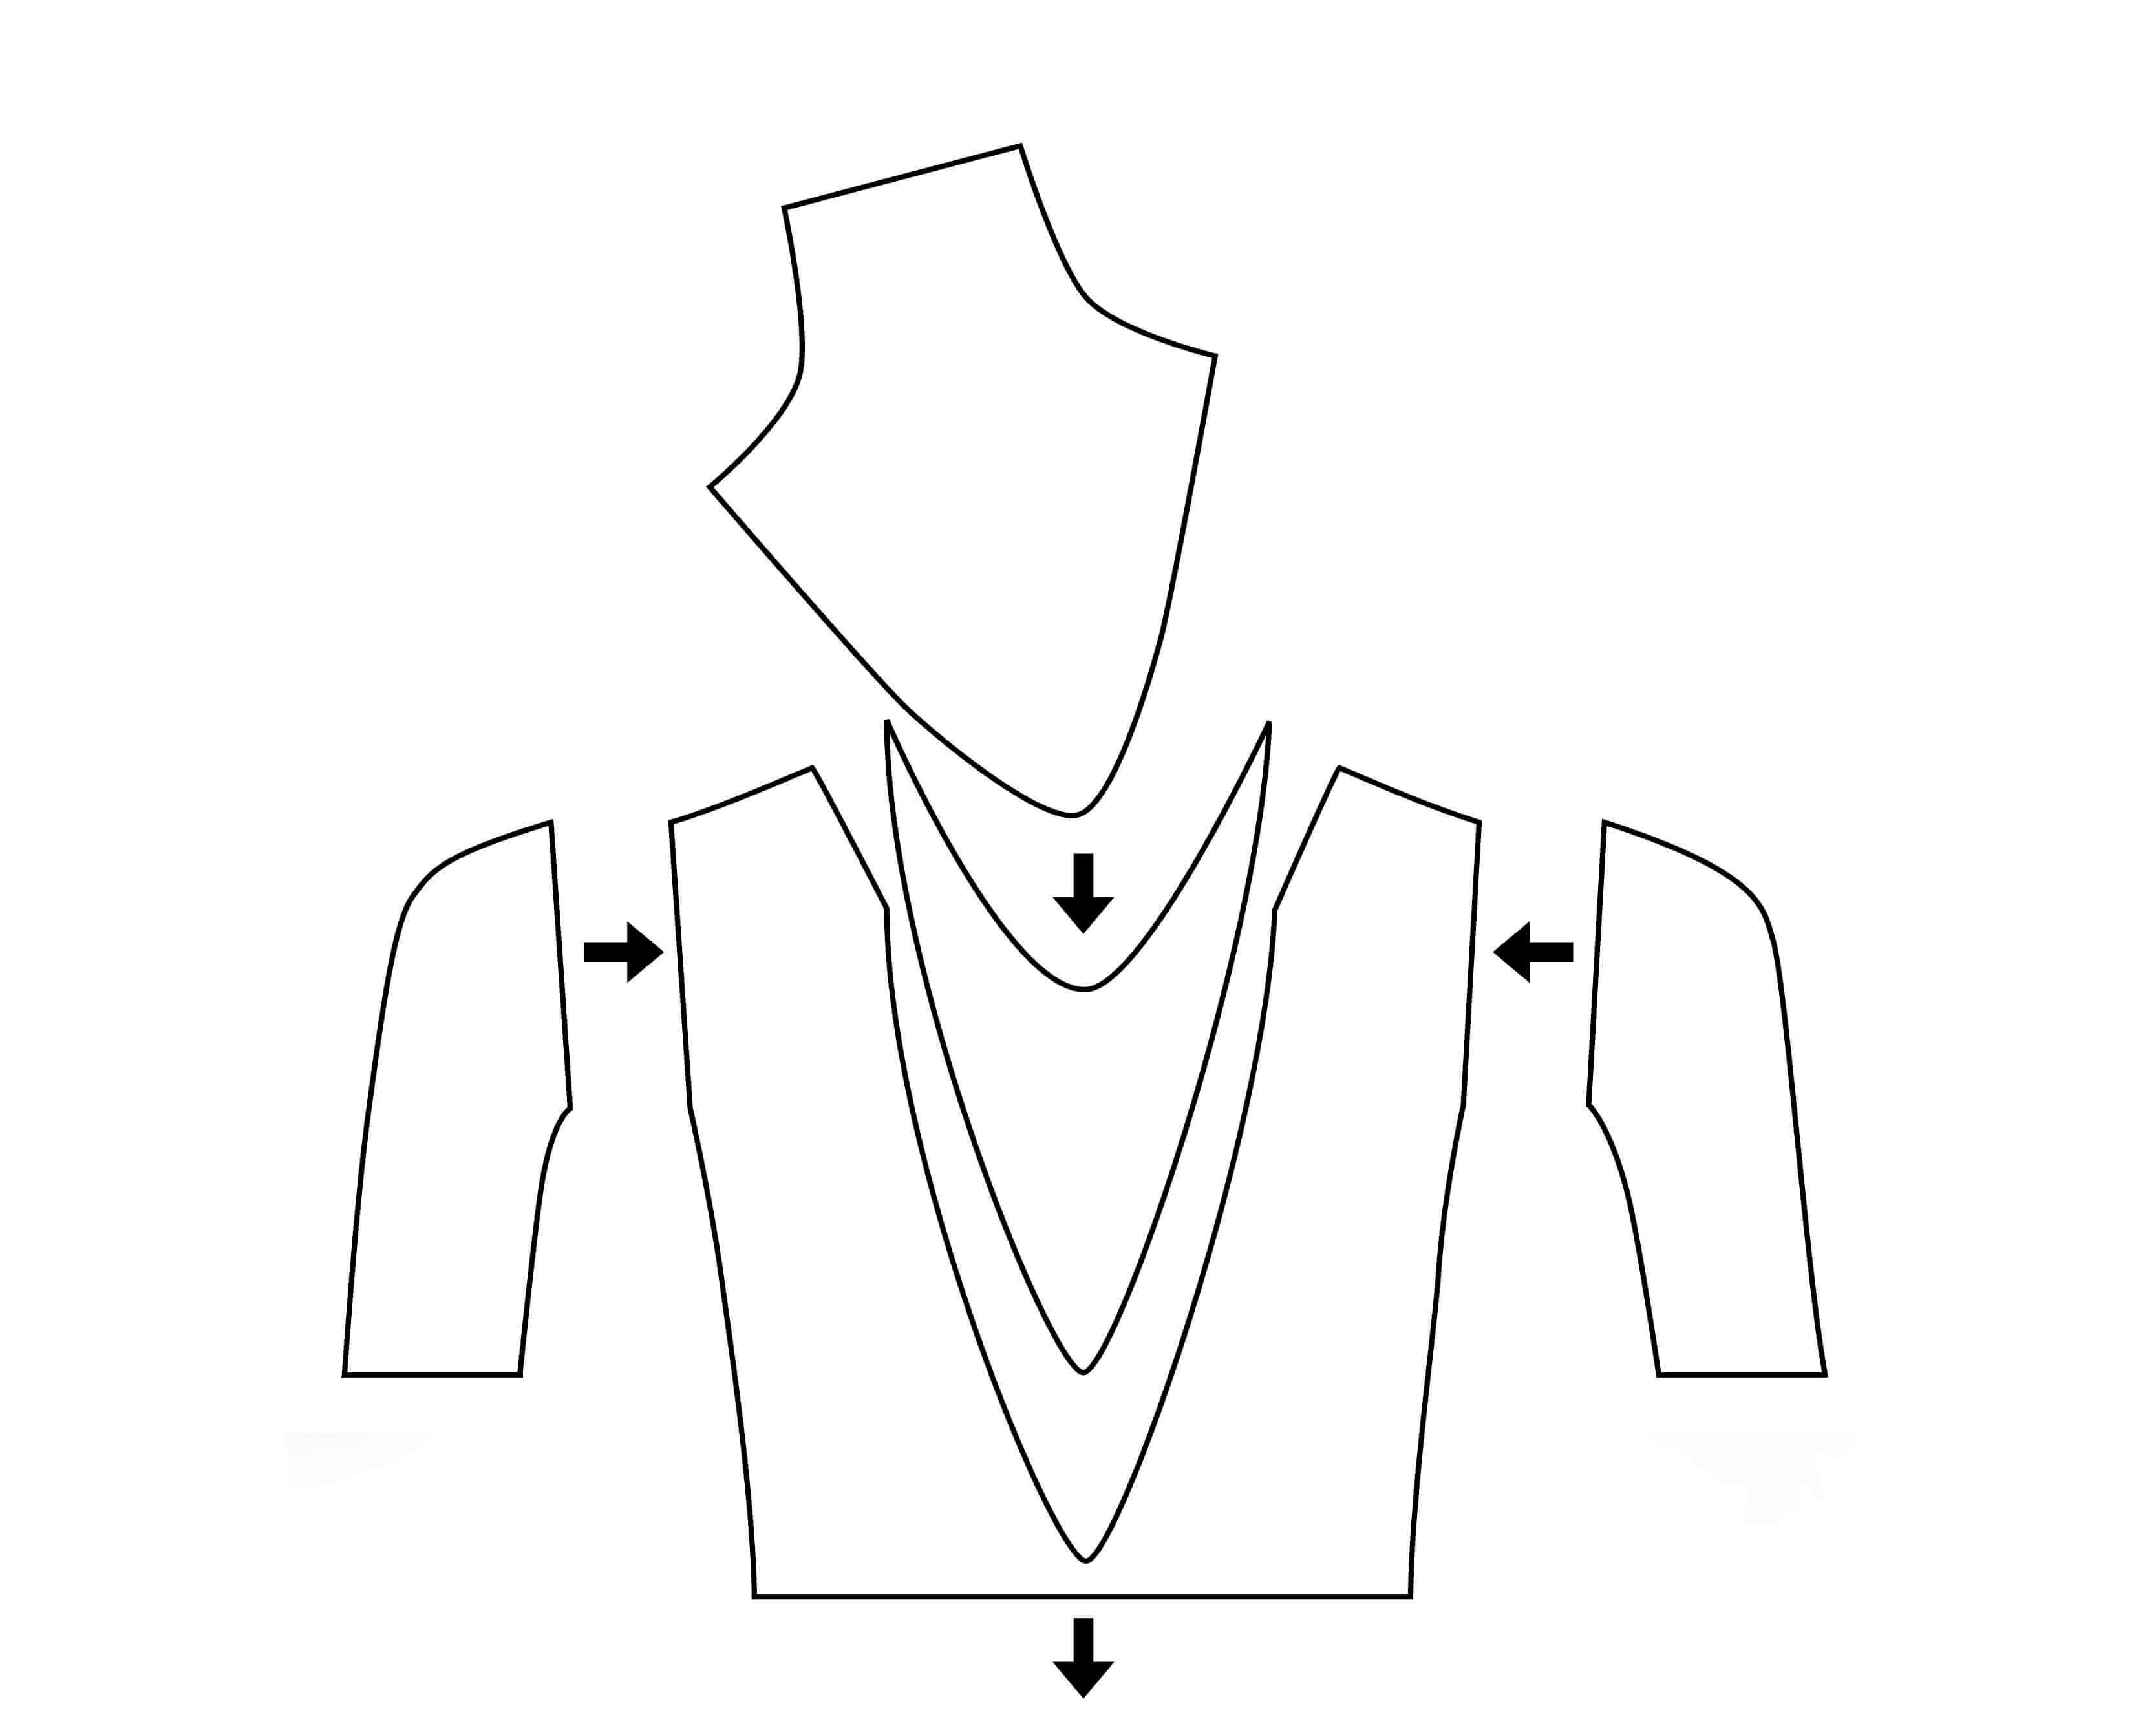 MohrModels Figur 1